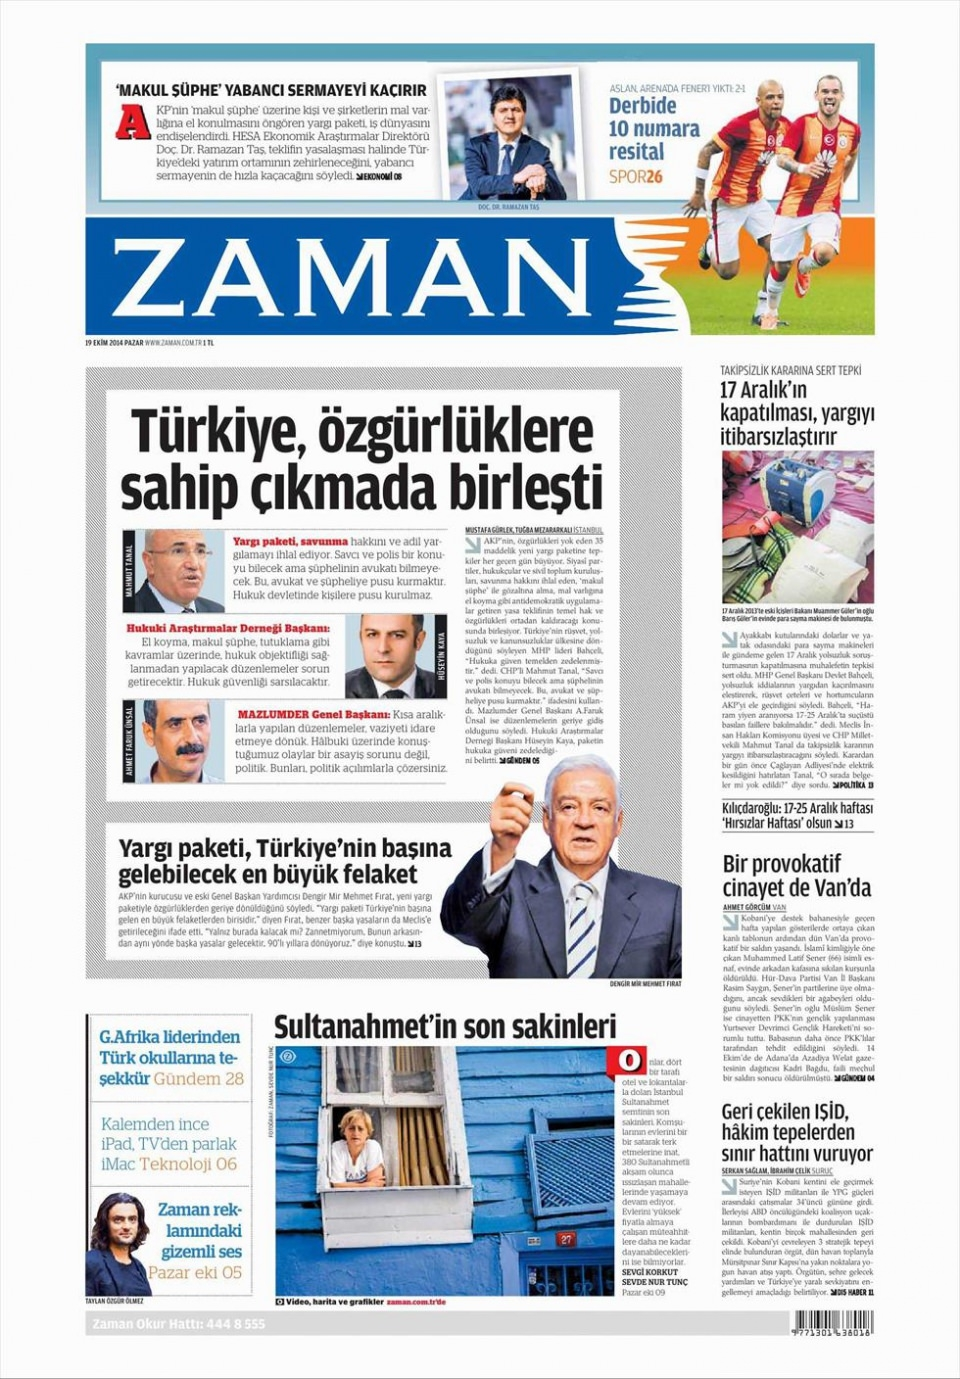 19 Ekim 2014 gazete manşetleri 19